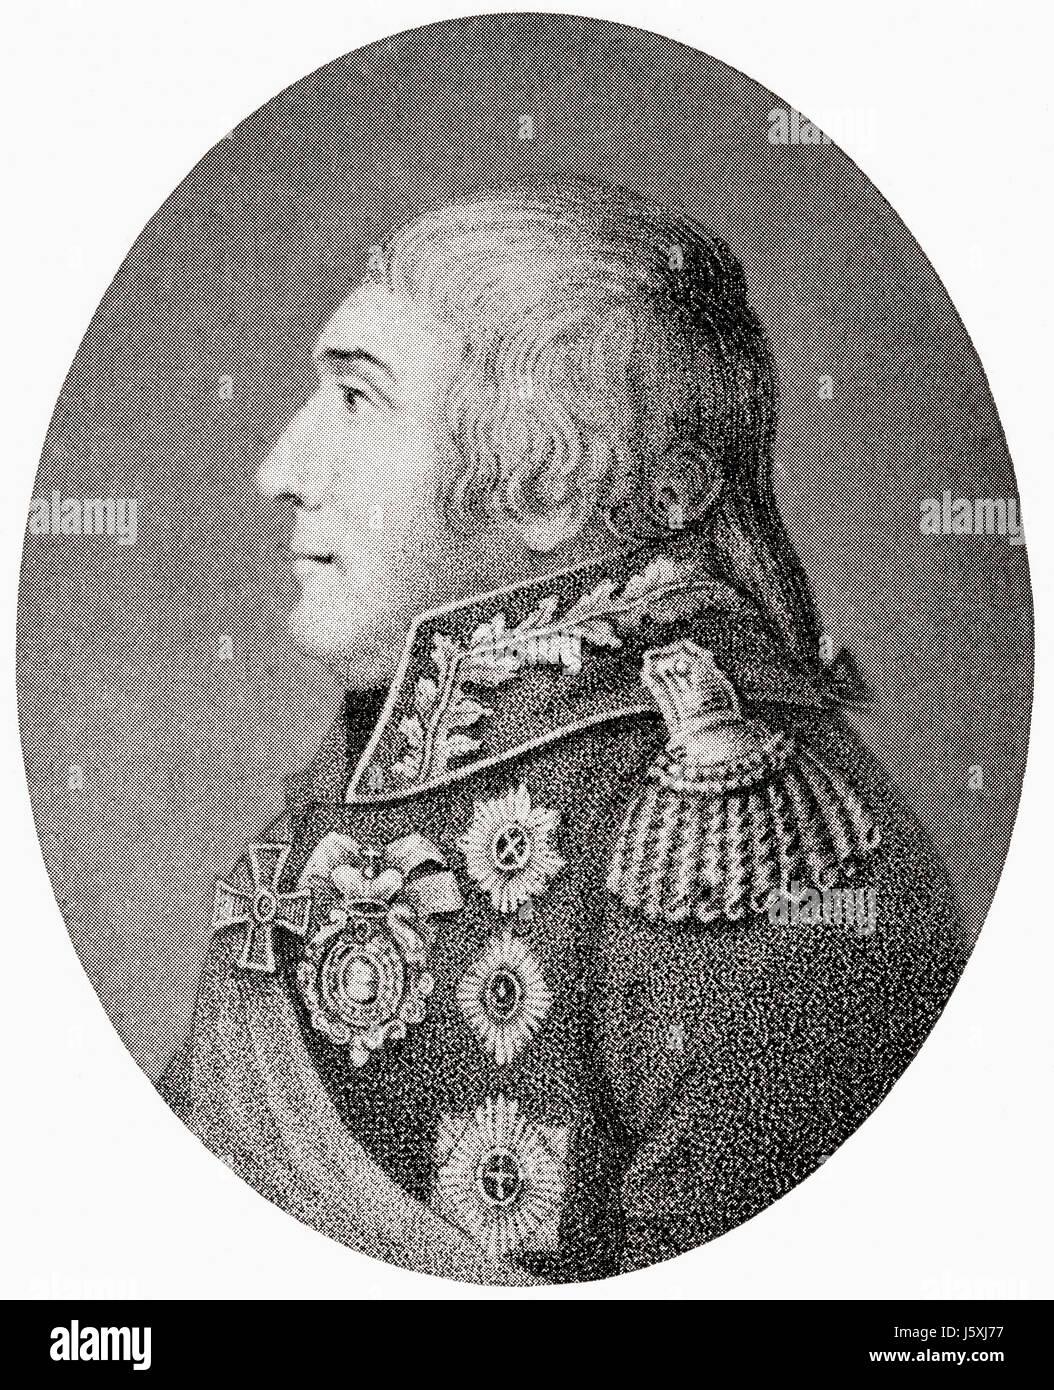 Prince Mikhail Illarionovich Golenishchev-Kutuzov, 1745 – 1813.  Field Marshal of the Russian Empire.  From Hutchinson's - Stock Image